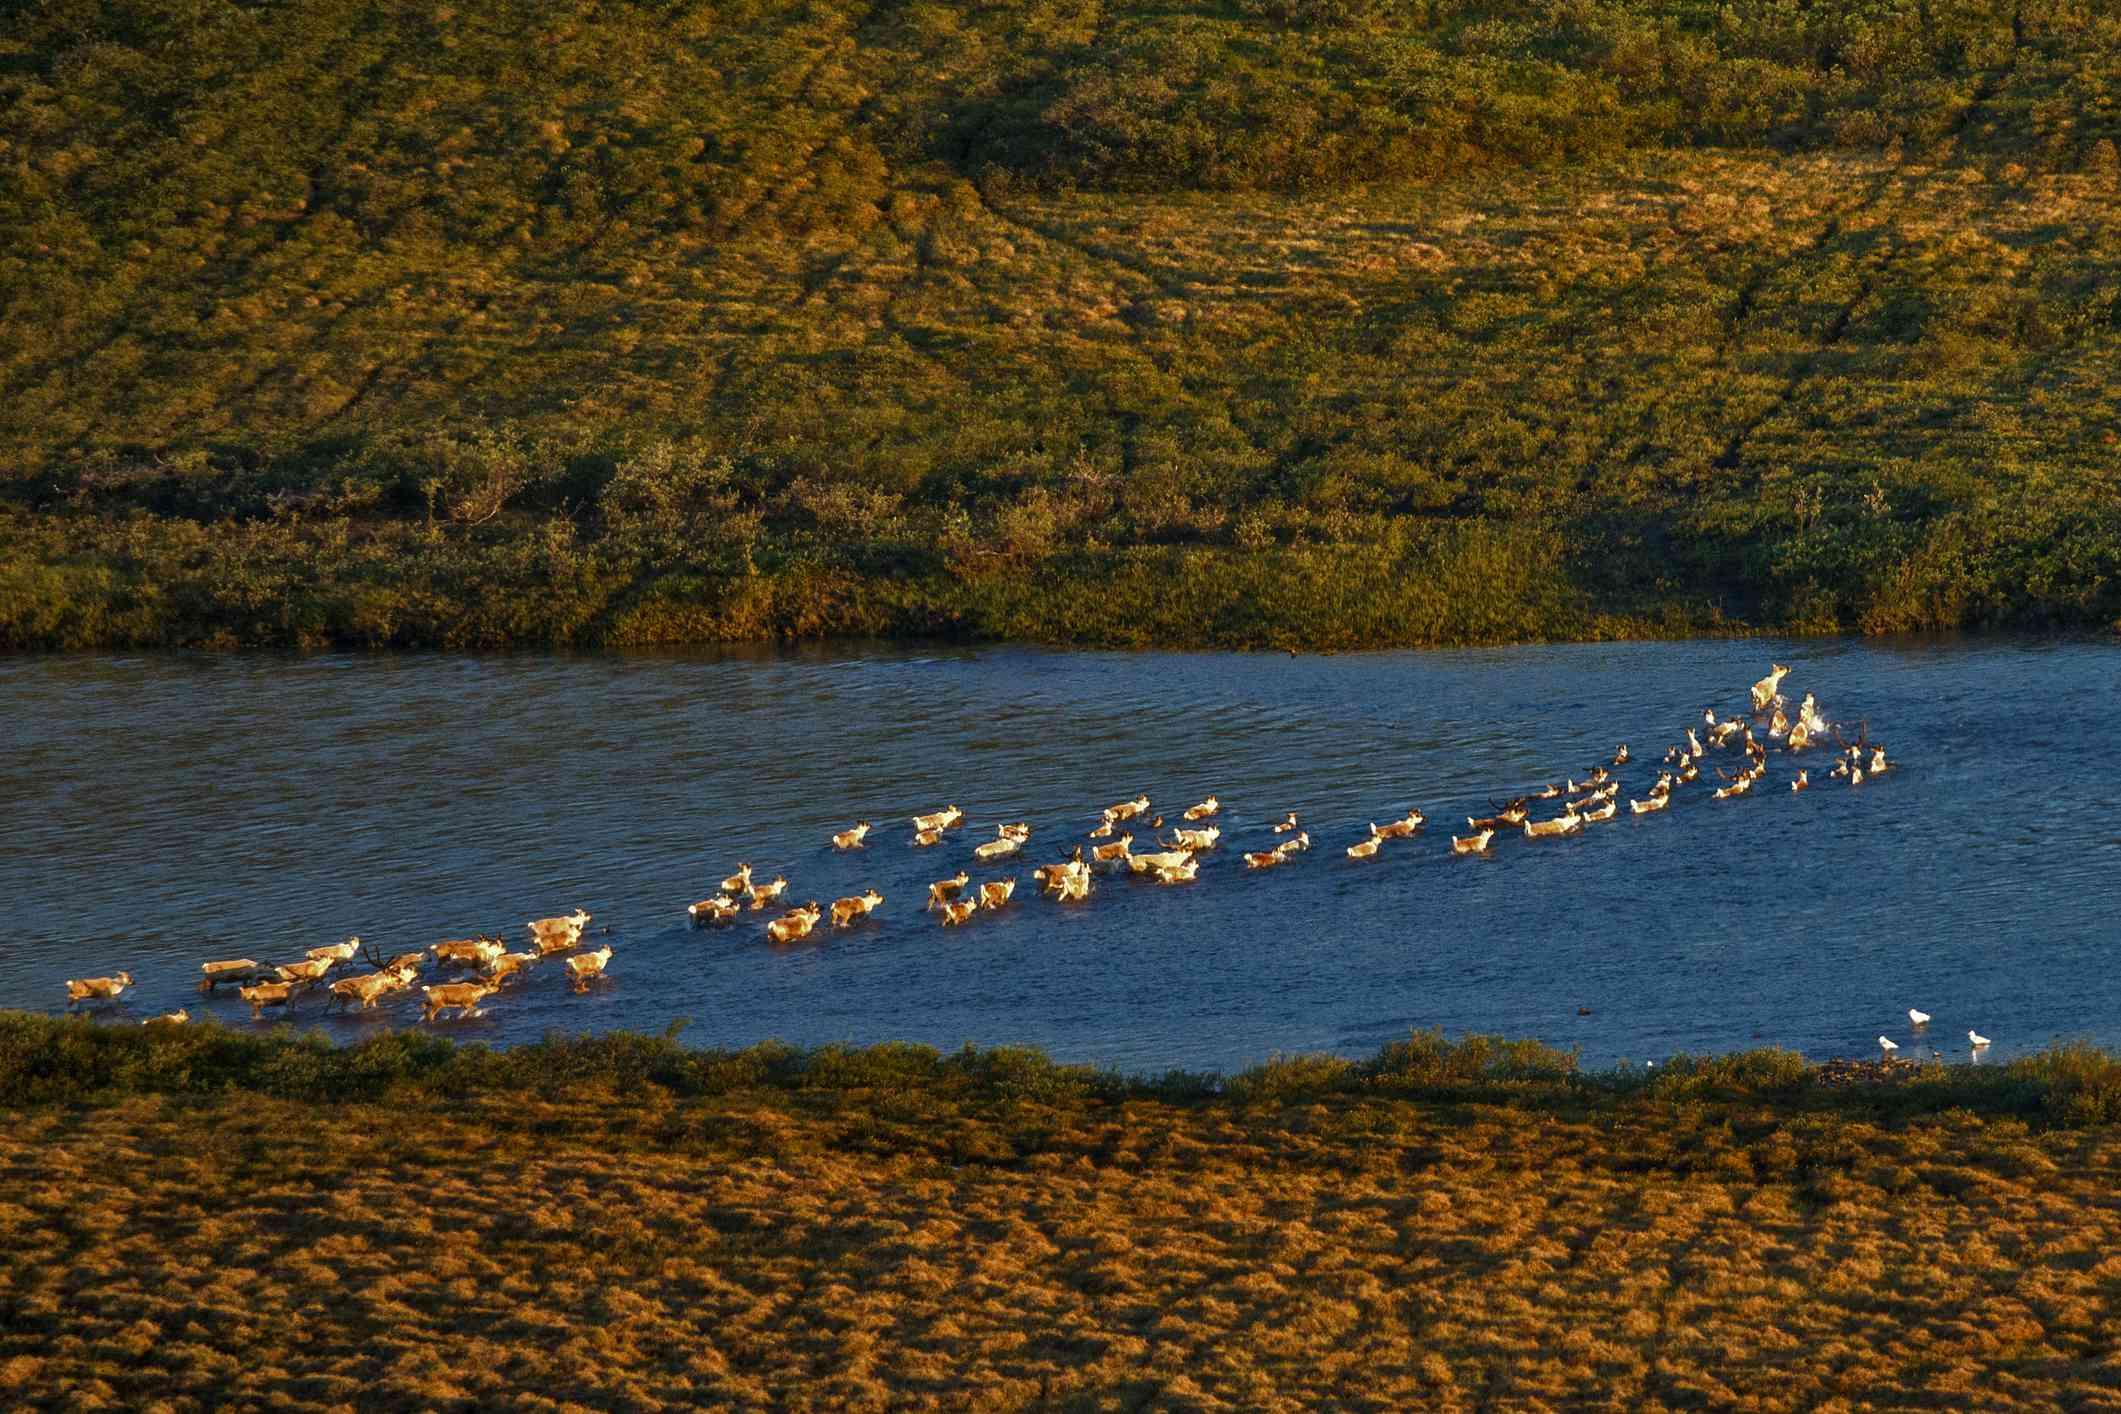 Migrating caribou swimming kokolik river